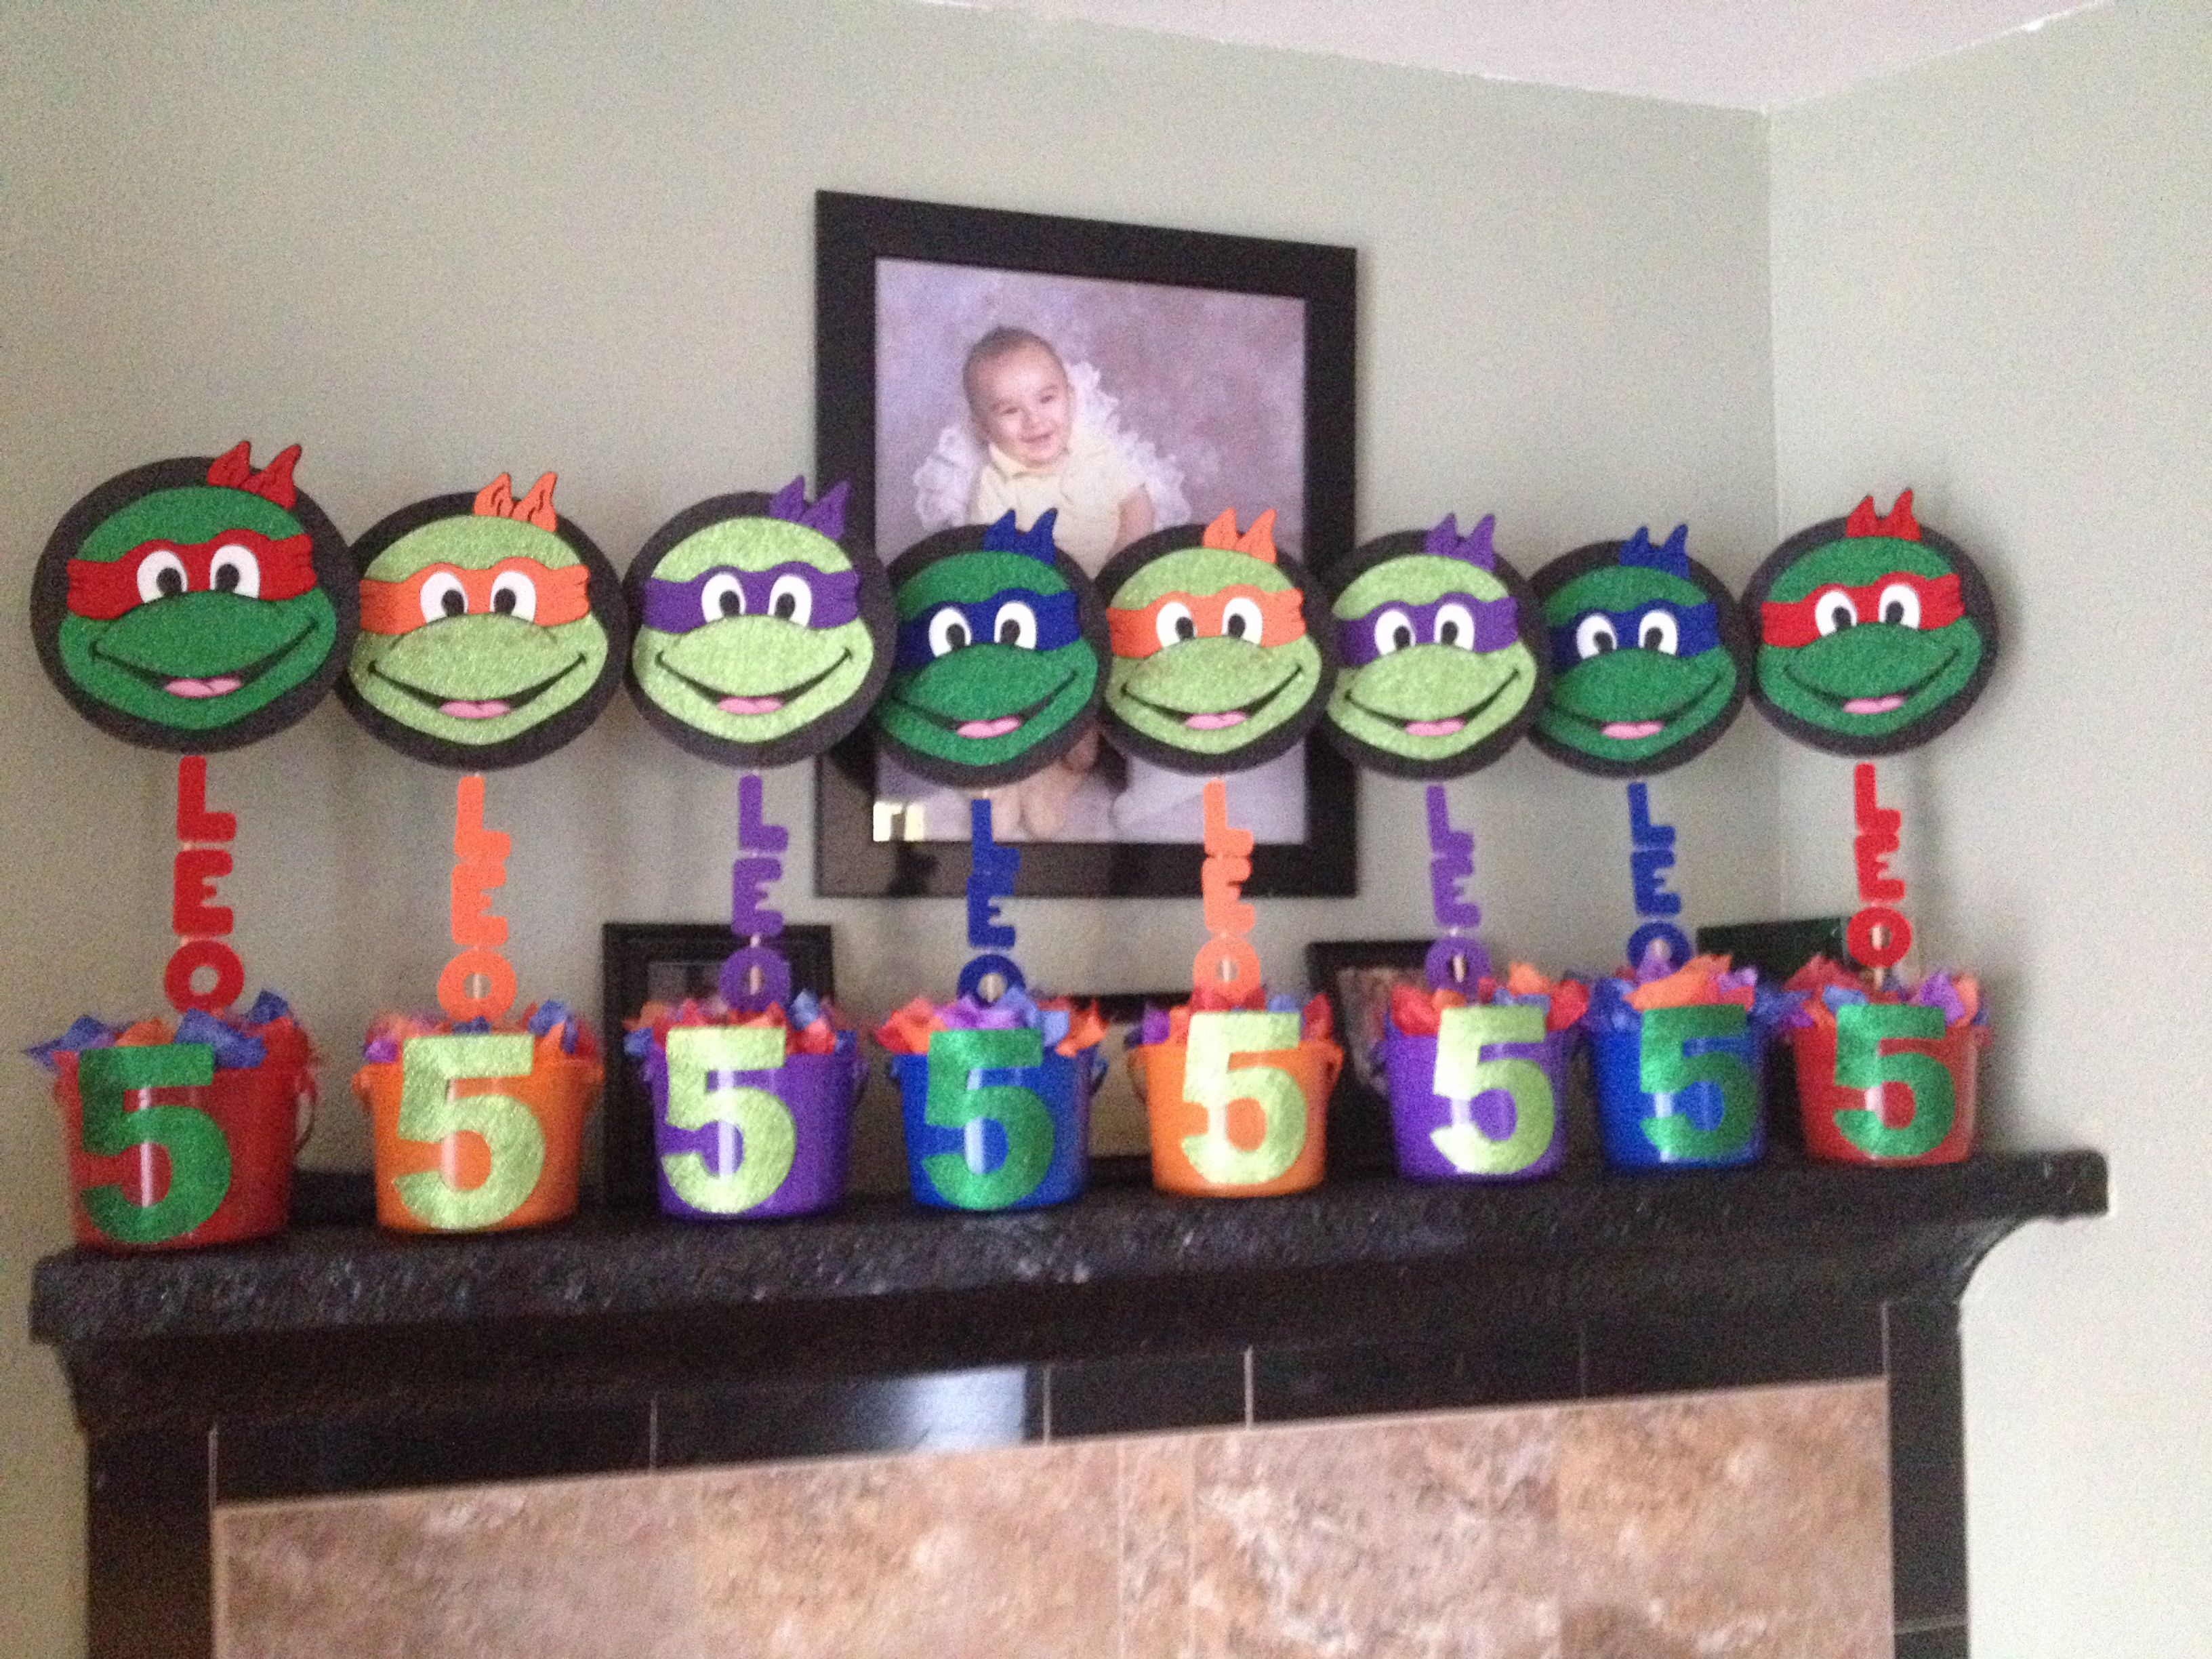 Pin By Gracy On Kids Party Ideas Ninja Turtles Birthday Party Ninja Turtle Party Turtle Party